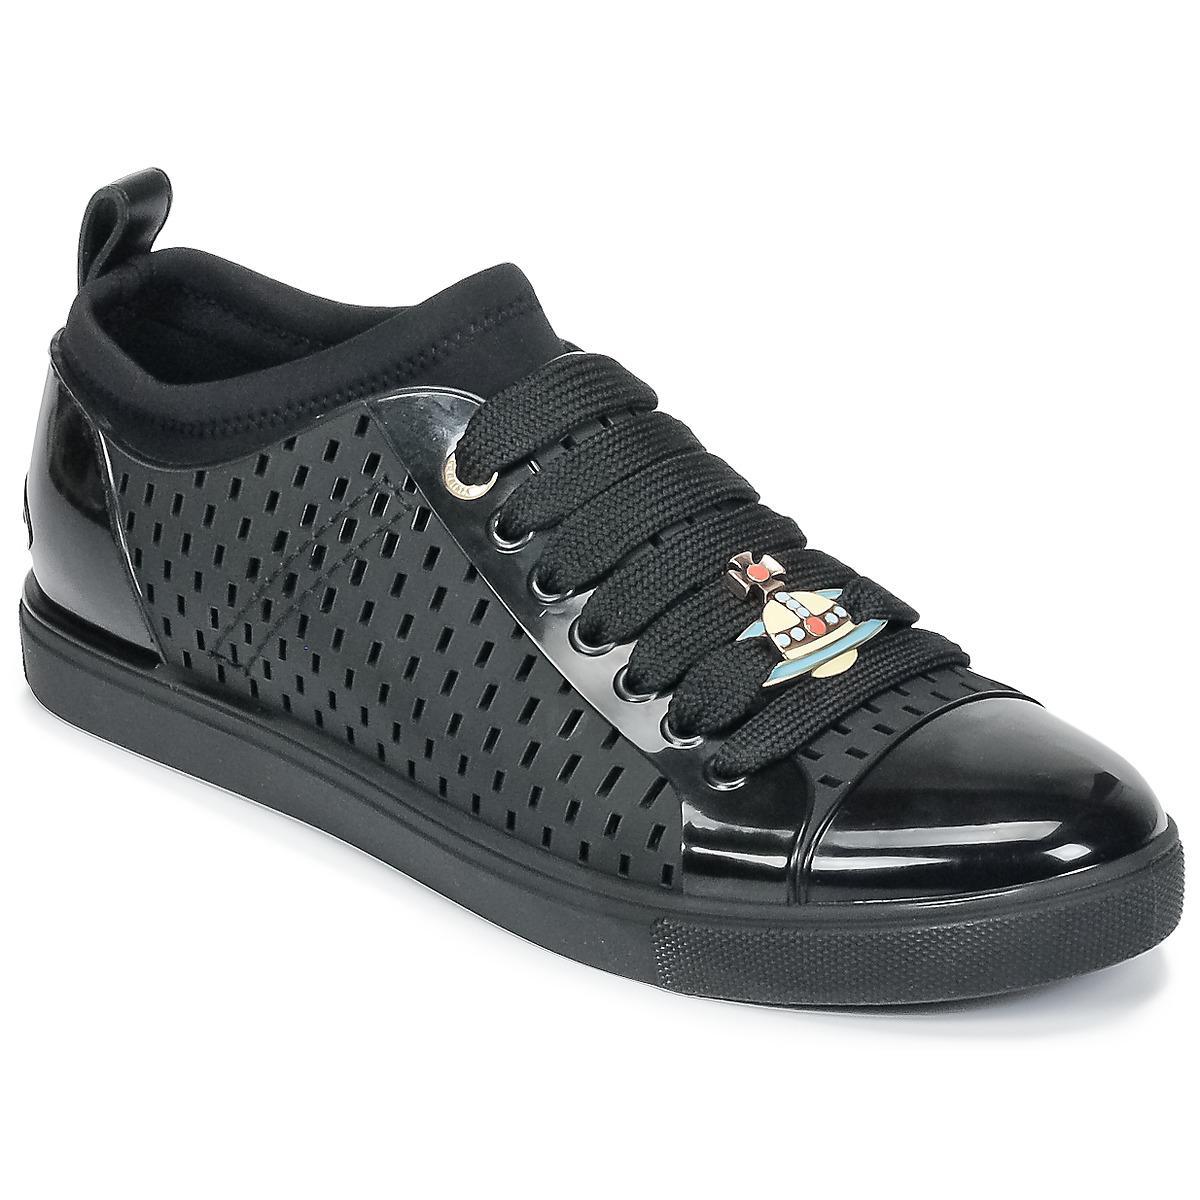 649b6670ce1b1 Vivienne Westwood Sneaker Orb Men's Shoes (trainers) In Black in ...